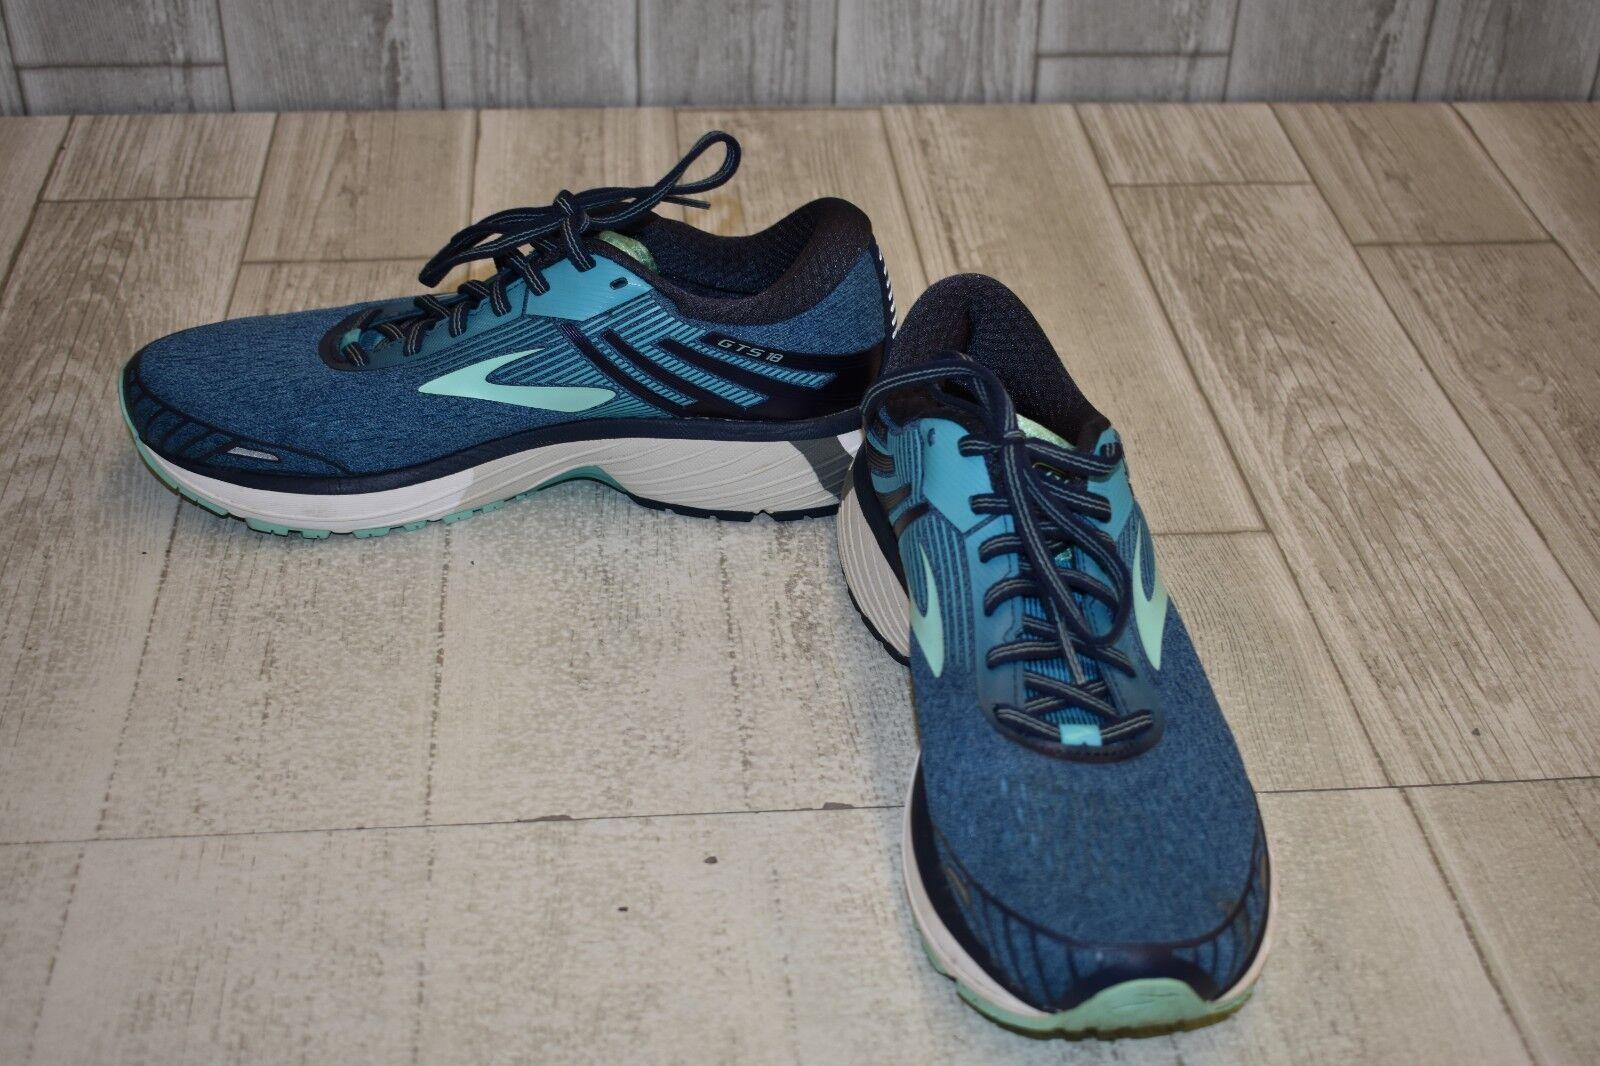 Brooks Adrenaline GTS 18 Running shoes, Women's Size 11 2A, Navy Teal